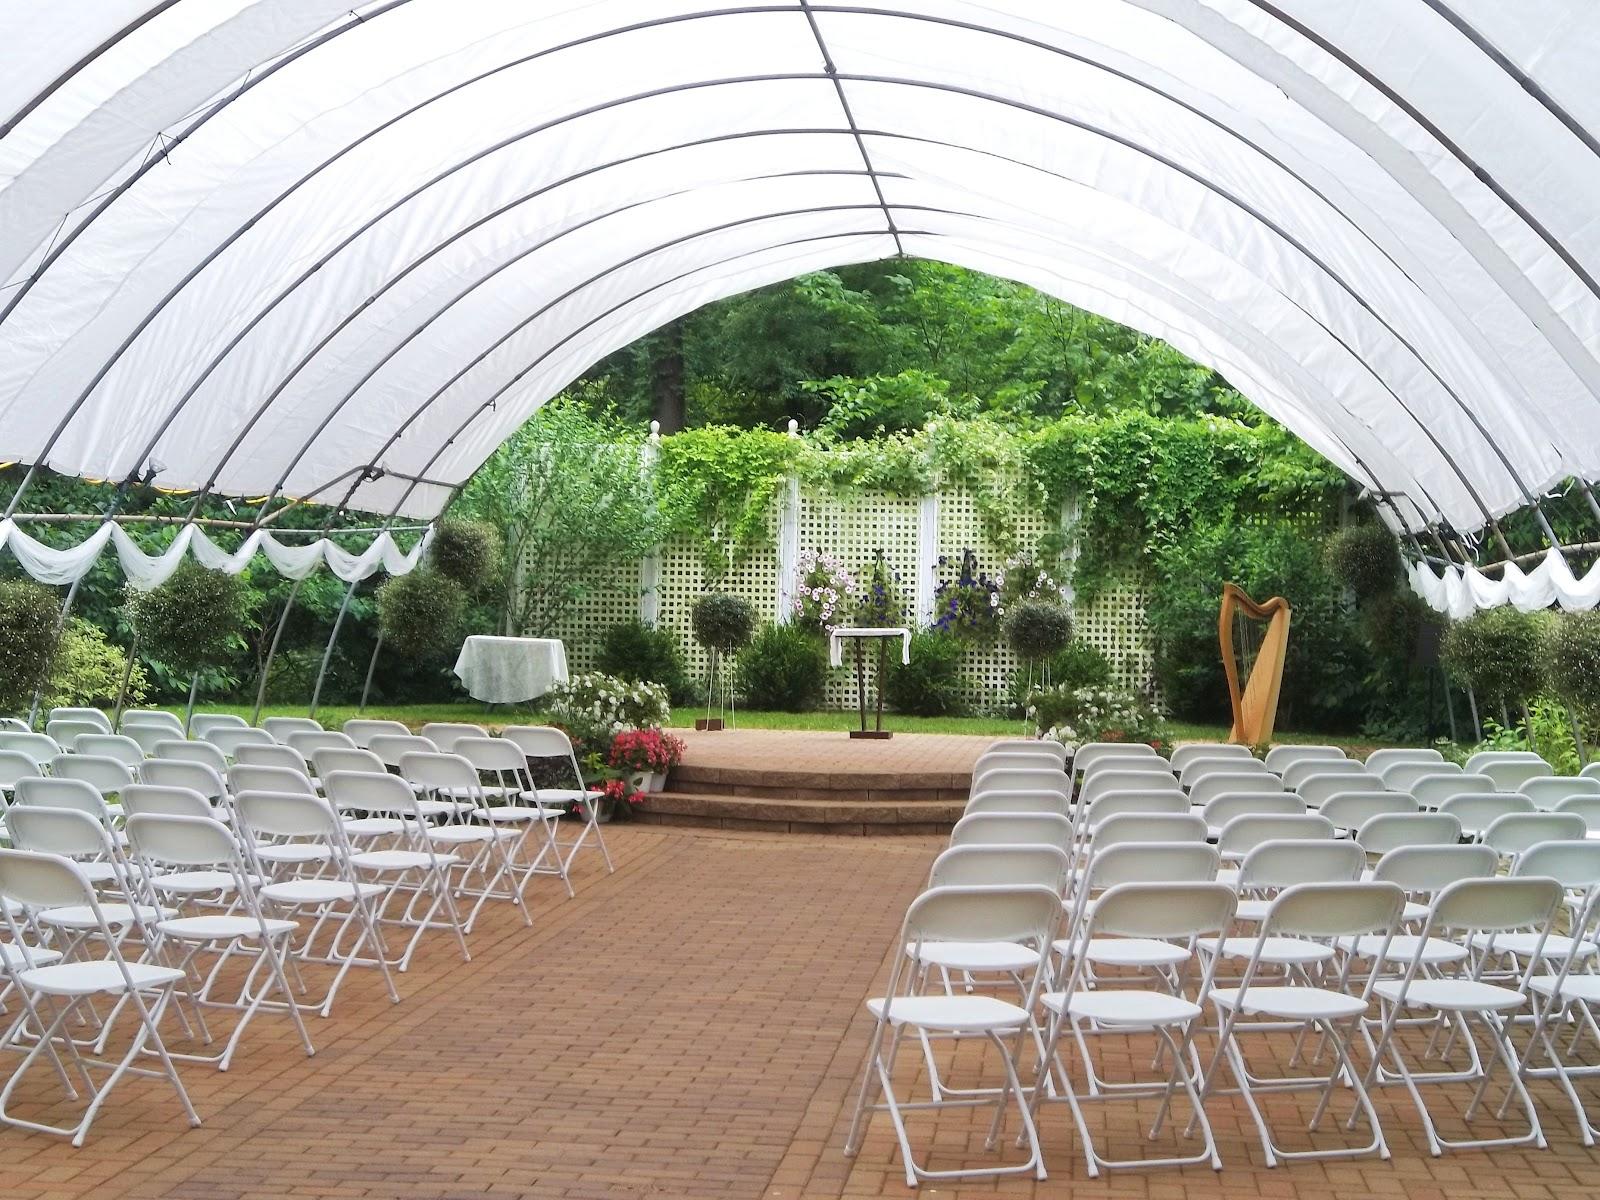 Michigan City Harpist Wedding At The International Friendship Gardens The Classic Harpist